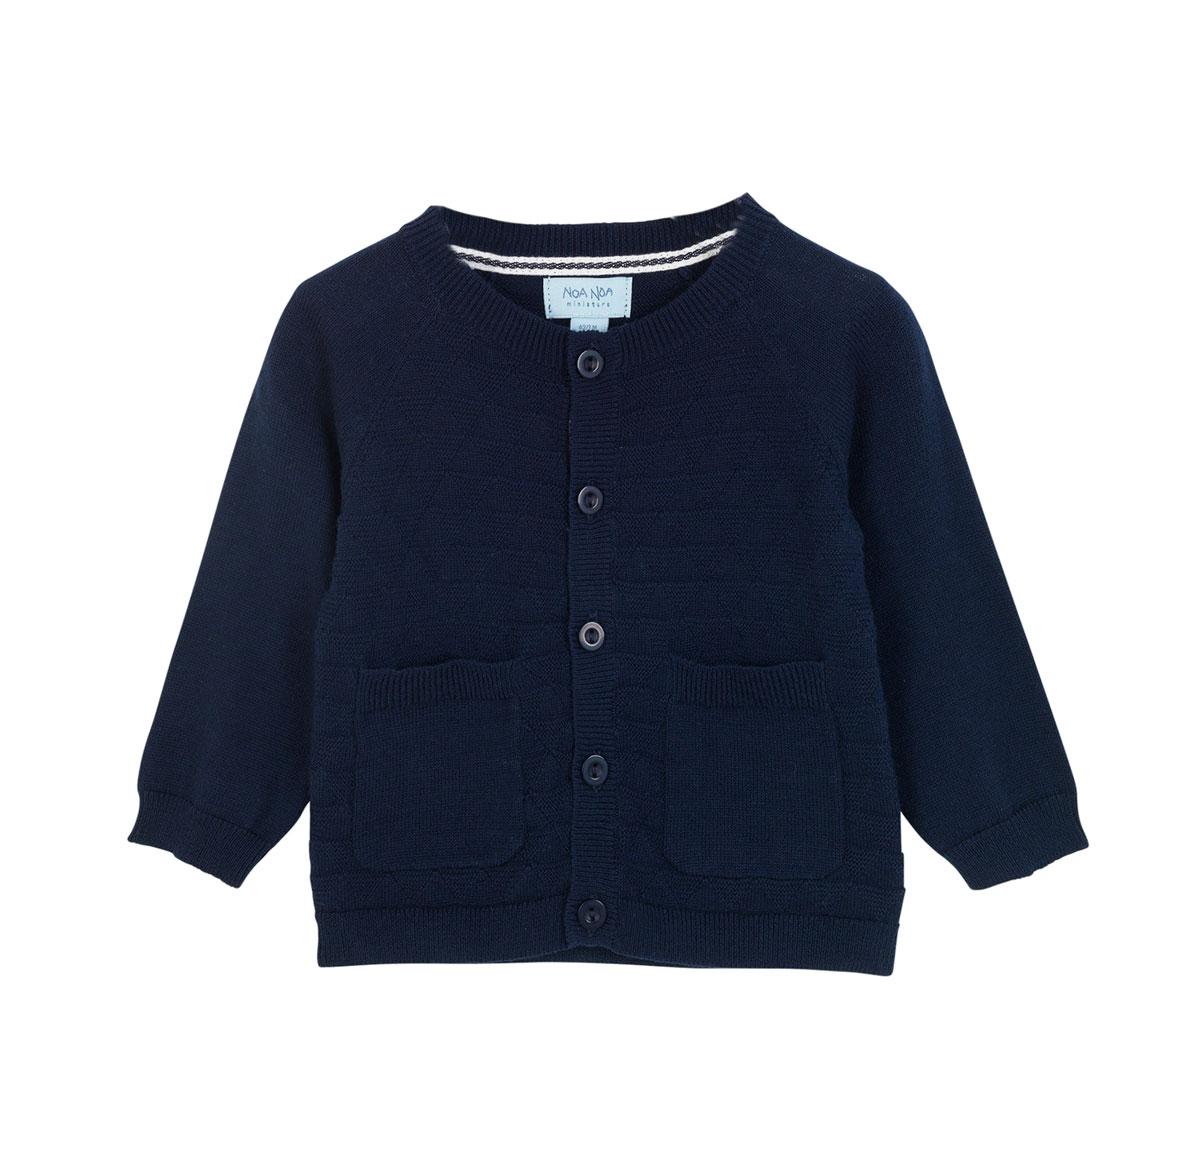 9afb365b Noa Noa Miniature strikket cardigan, marineblå - DressMyKid AS